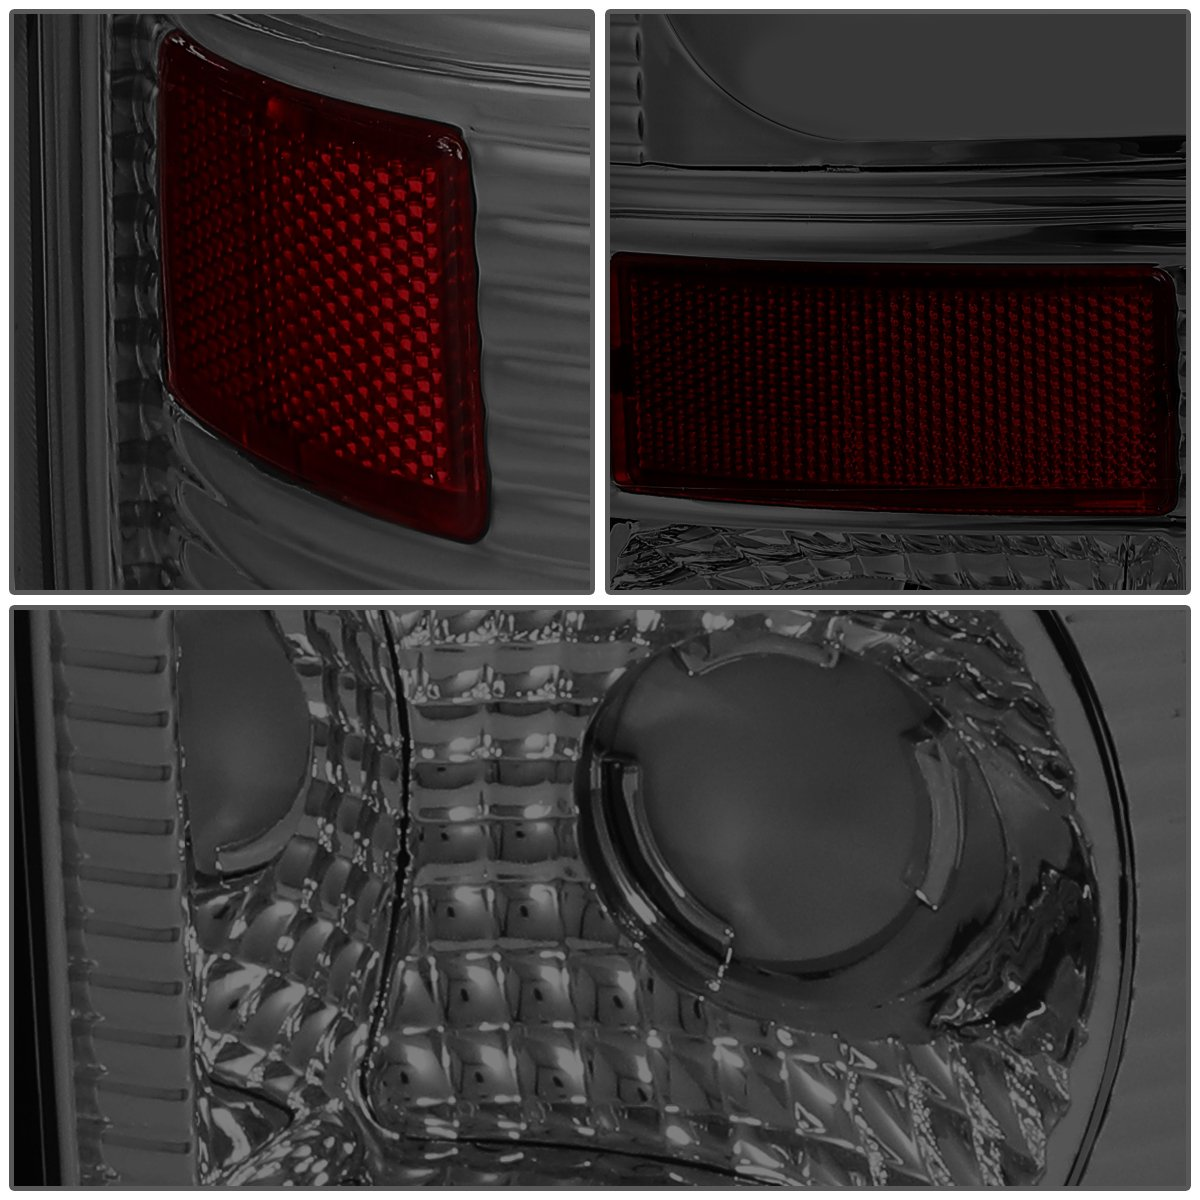 DNA Motoring TL-F15097-LED-3D-SM-G2 Pair Chrome Housing Smoked Lens 3D LED Tail Lights For 97-07 Ford F150-550